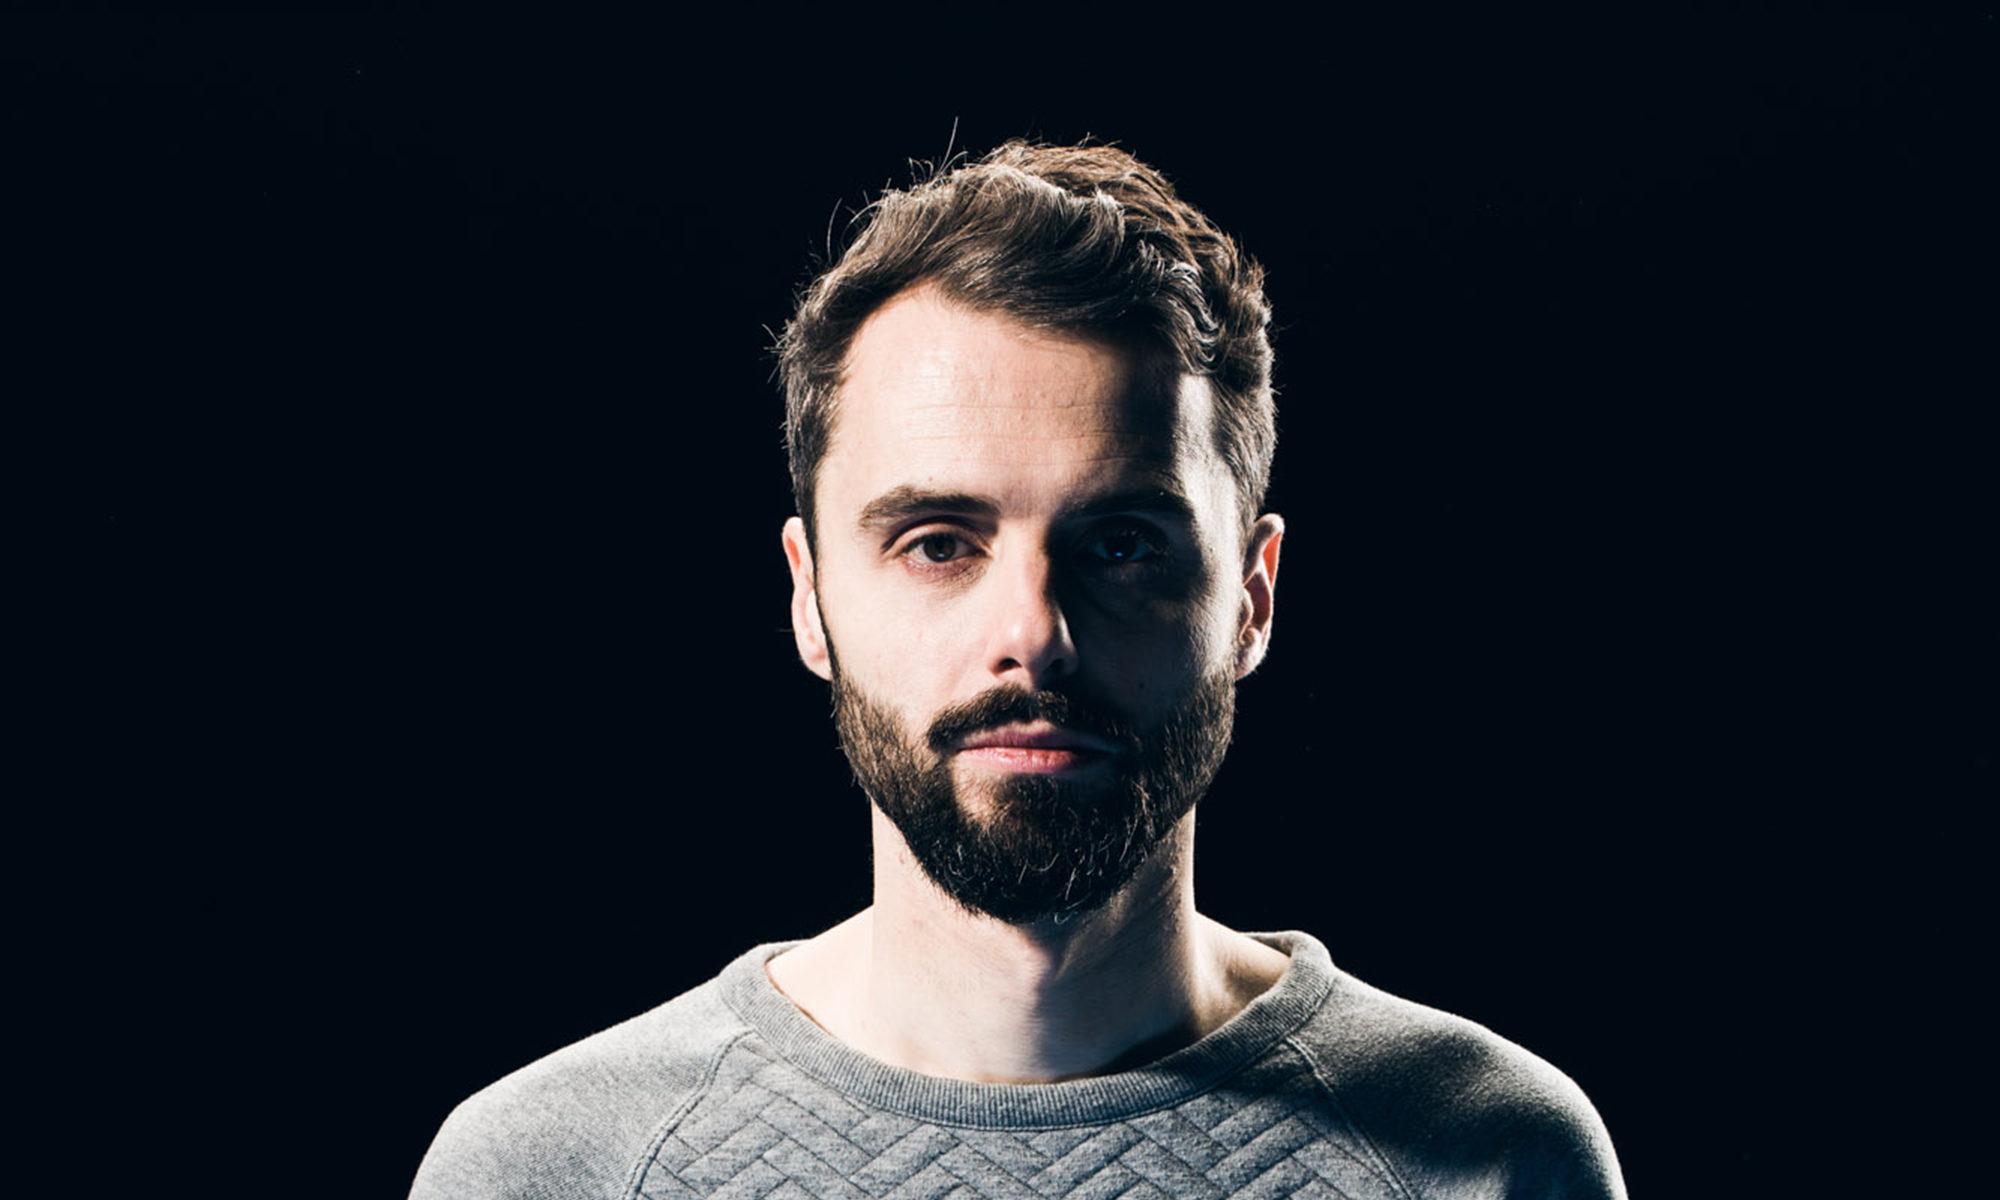 Markus Reindl - curator & musician, Linz, Austria